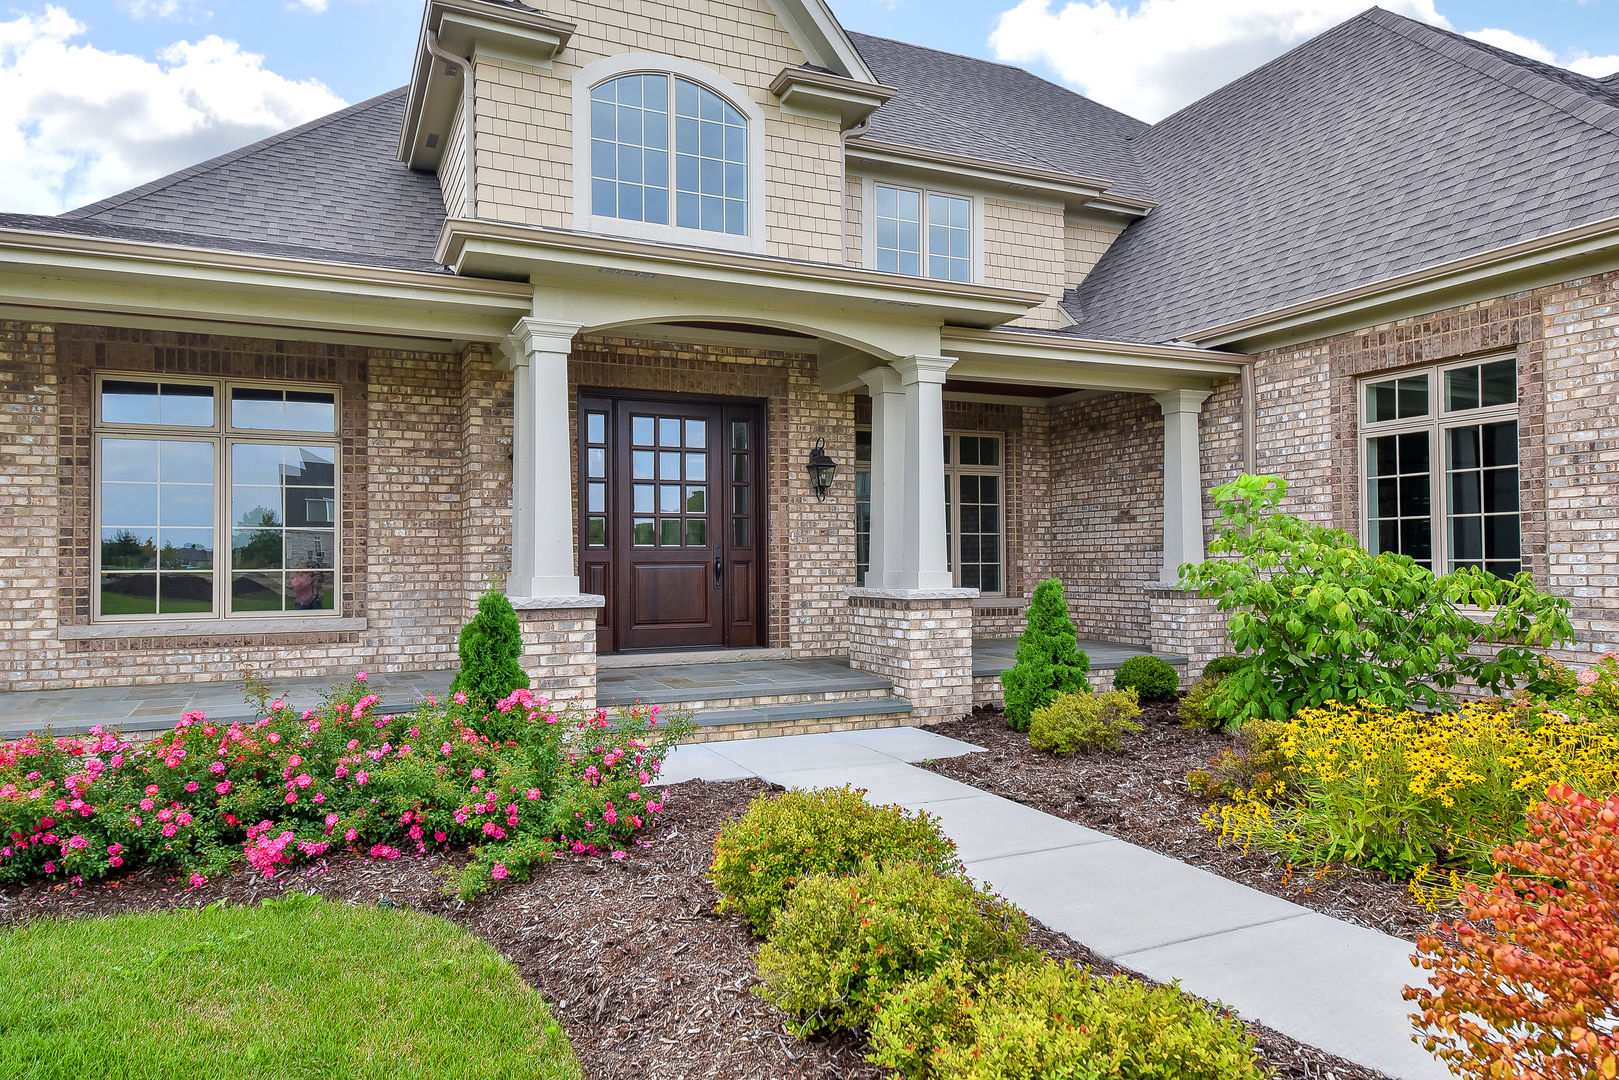 5N238 Switchgrass, ST. CHARLES, Illinois, 60175